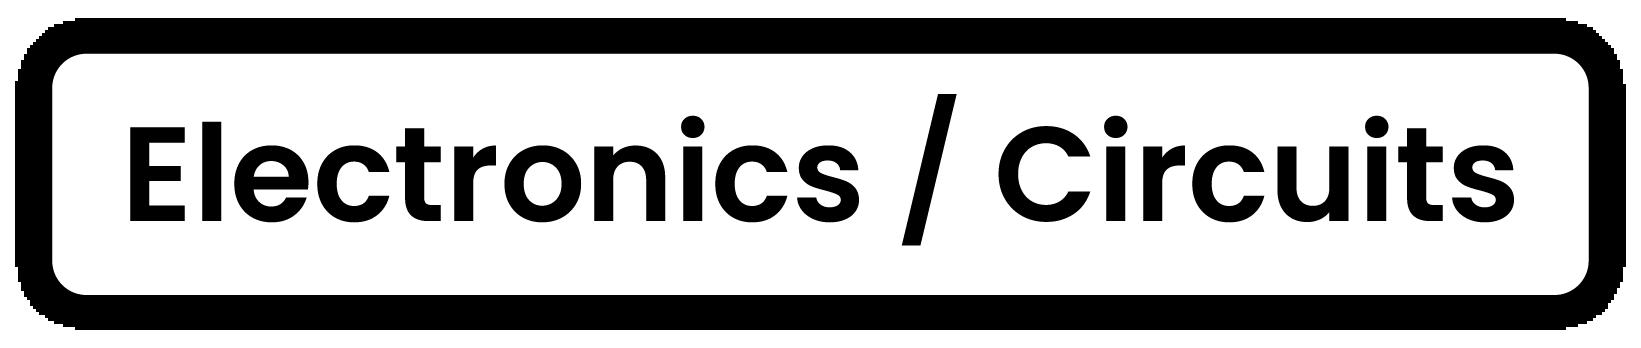 Development process label: Electronic/Circuits